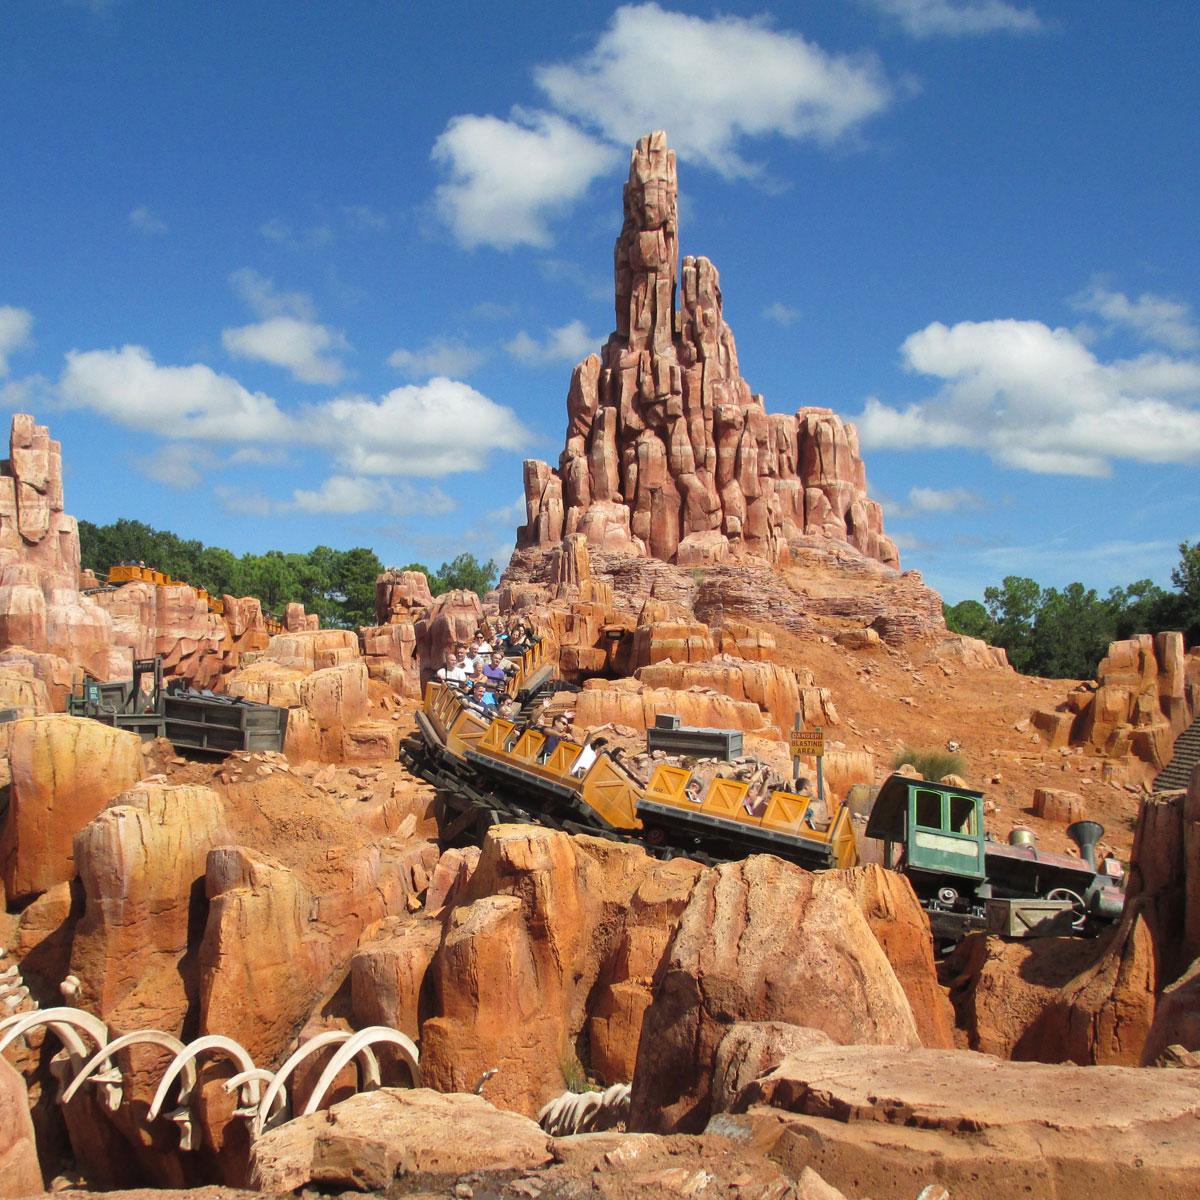 Big Thunder Mt Walt Disney World